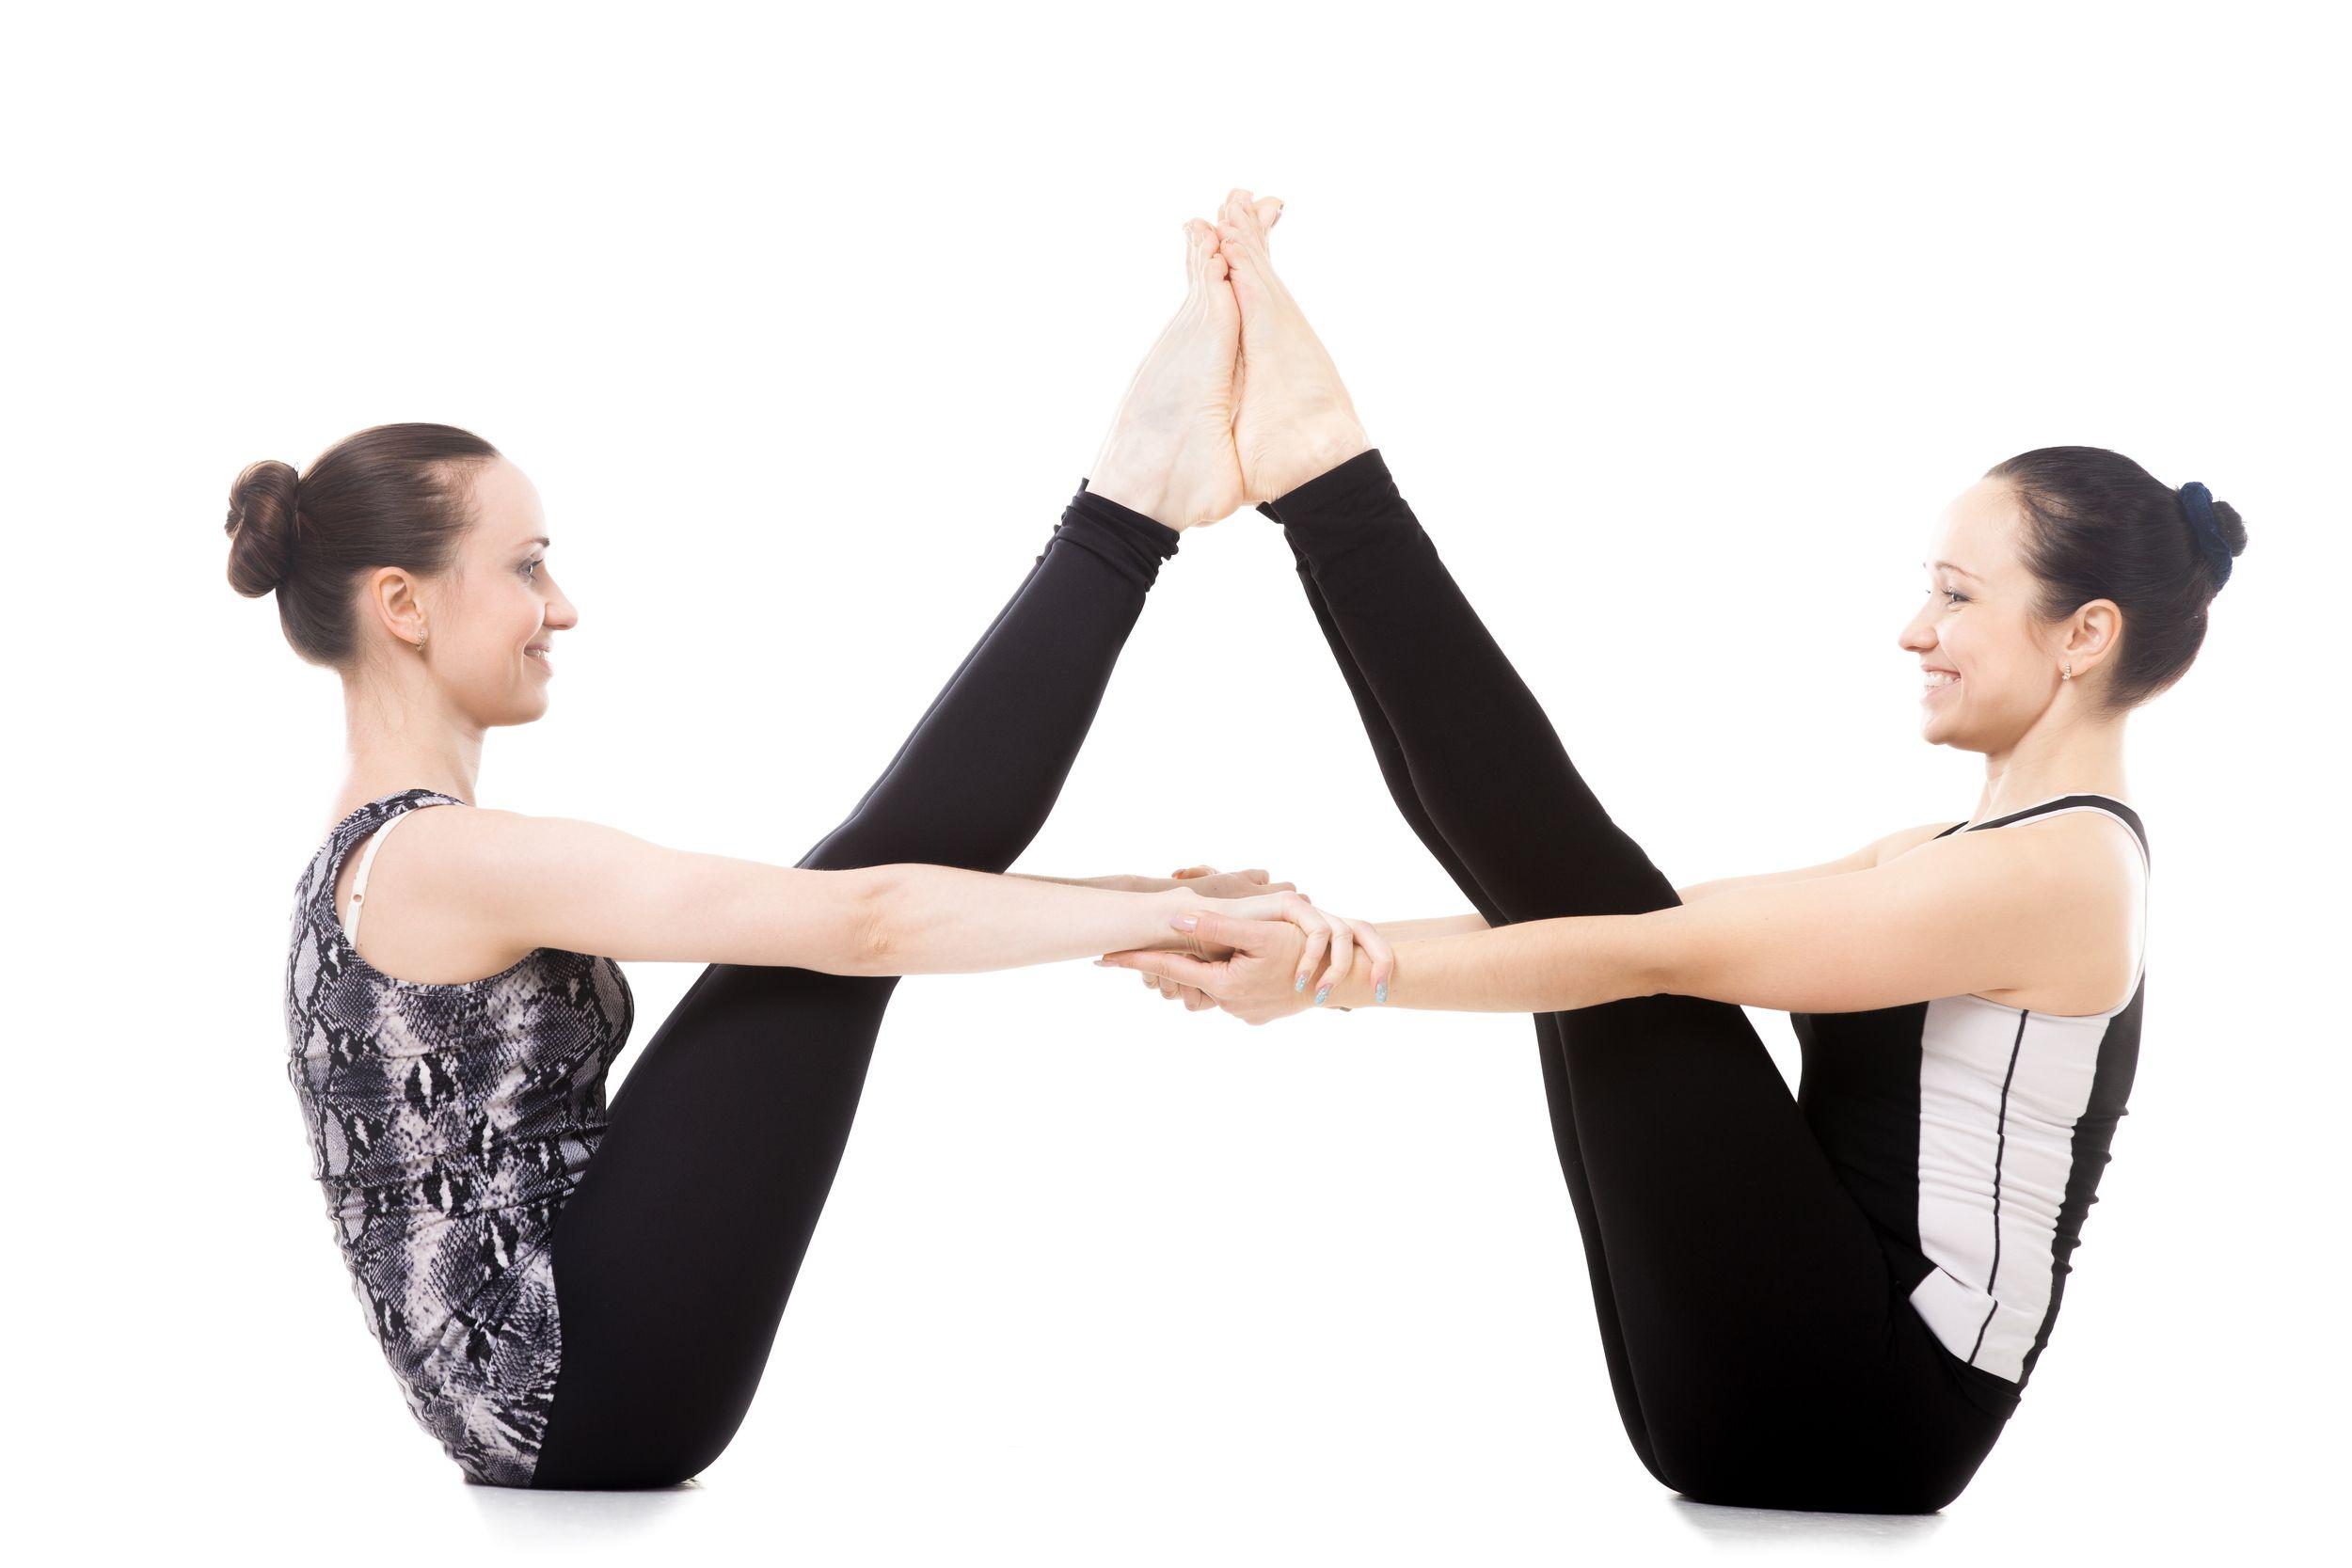 Partner Yoga And Thai Massage Http Www Korsiyoga Com Studio Events